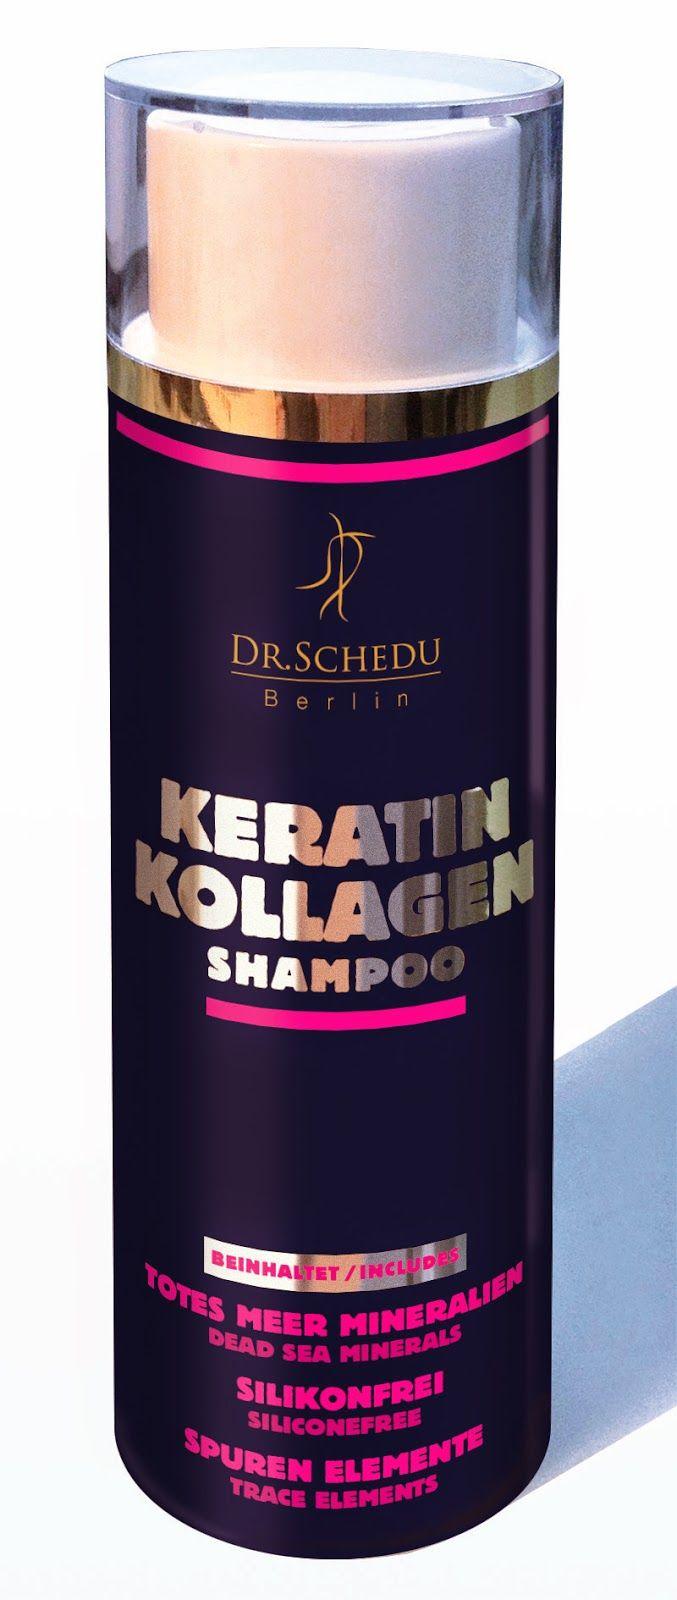 MilaLanusa´s Beauty and Fashion World: Dr. Schedu Kollagen Keratin Shampoo